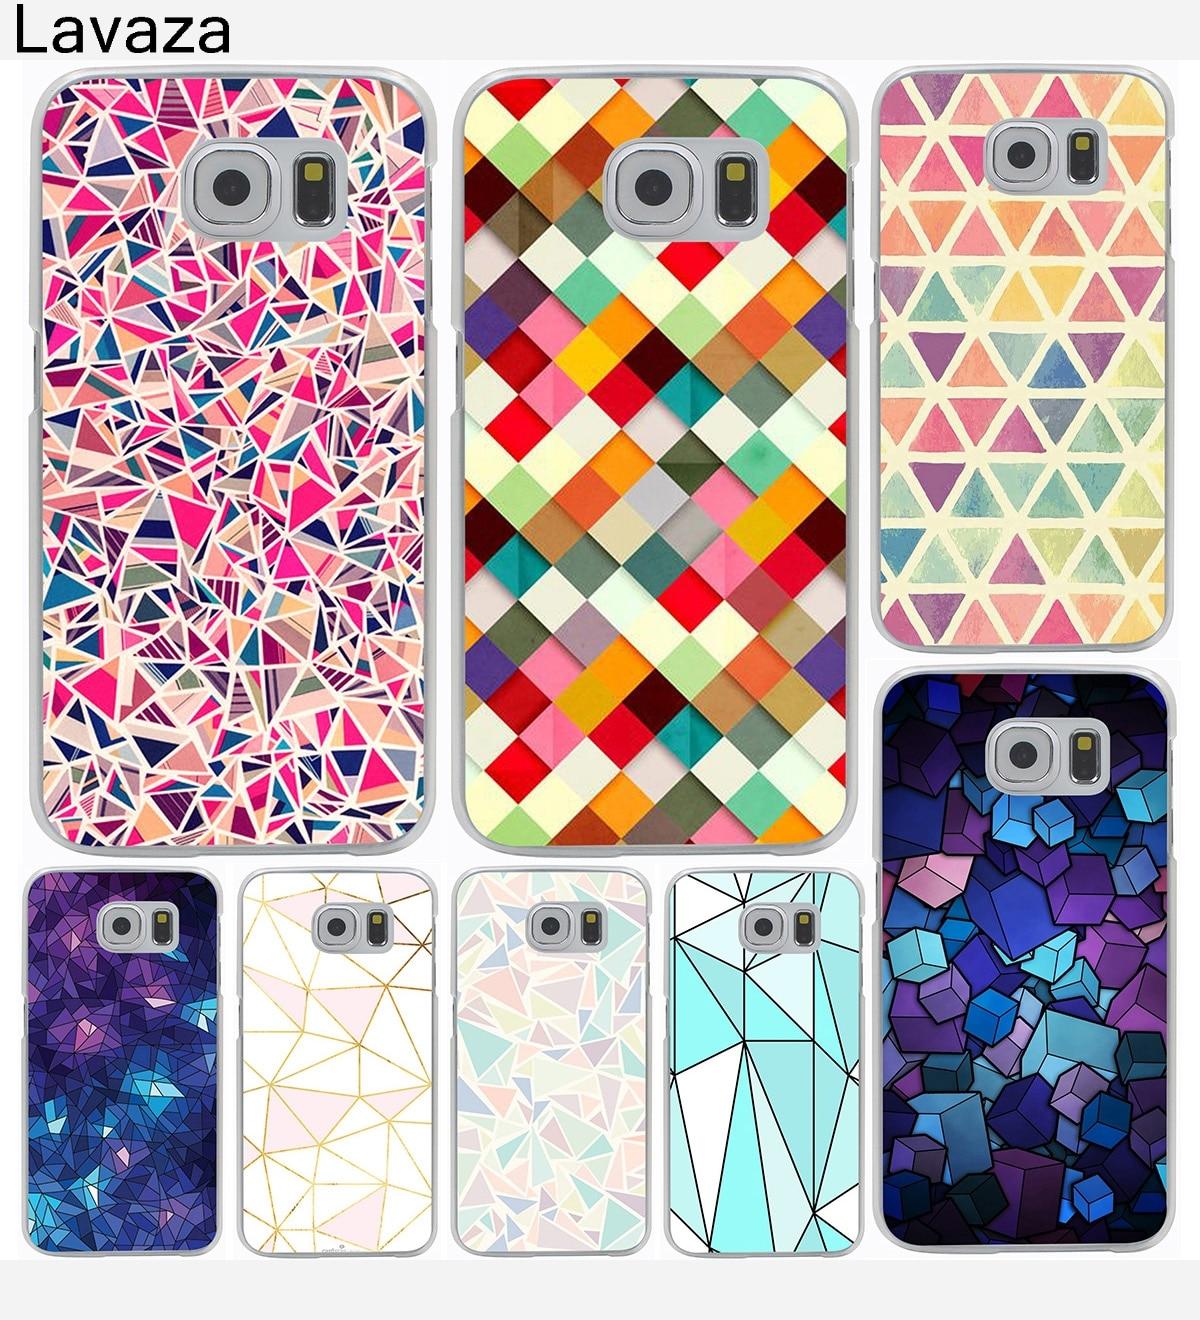 Fashionable Geometric Graphic Hard Cover Case for Galaxy S3 S4 S5 & Mini S6 S7 S8 Edge Plus